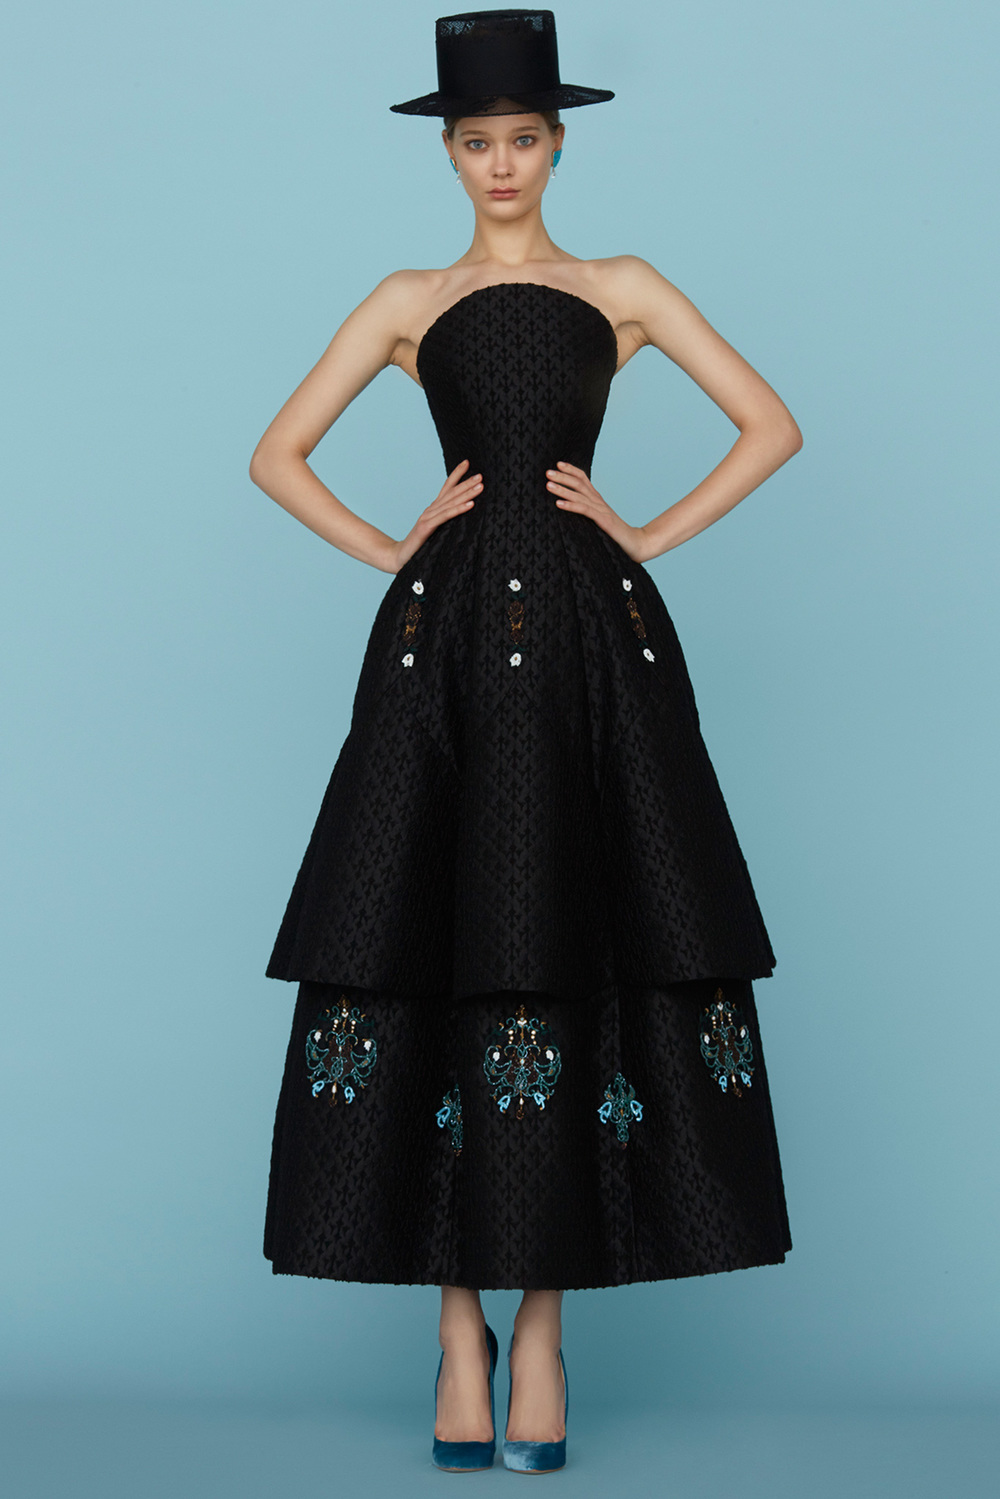 Spring 2015 Couture   Ulana Sergeenko